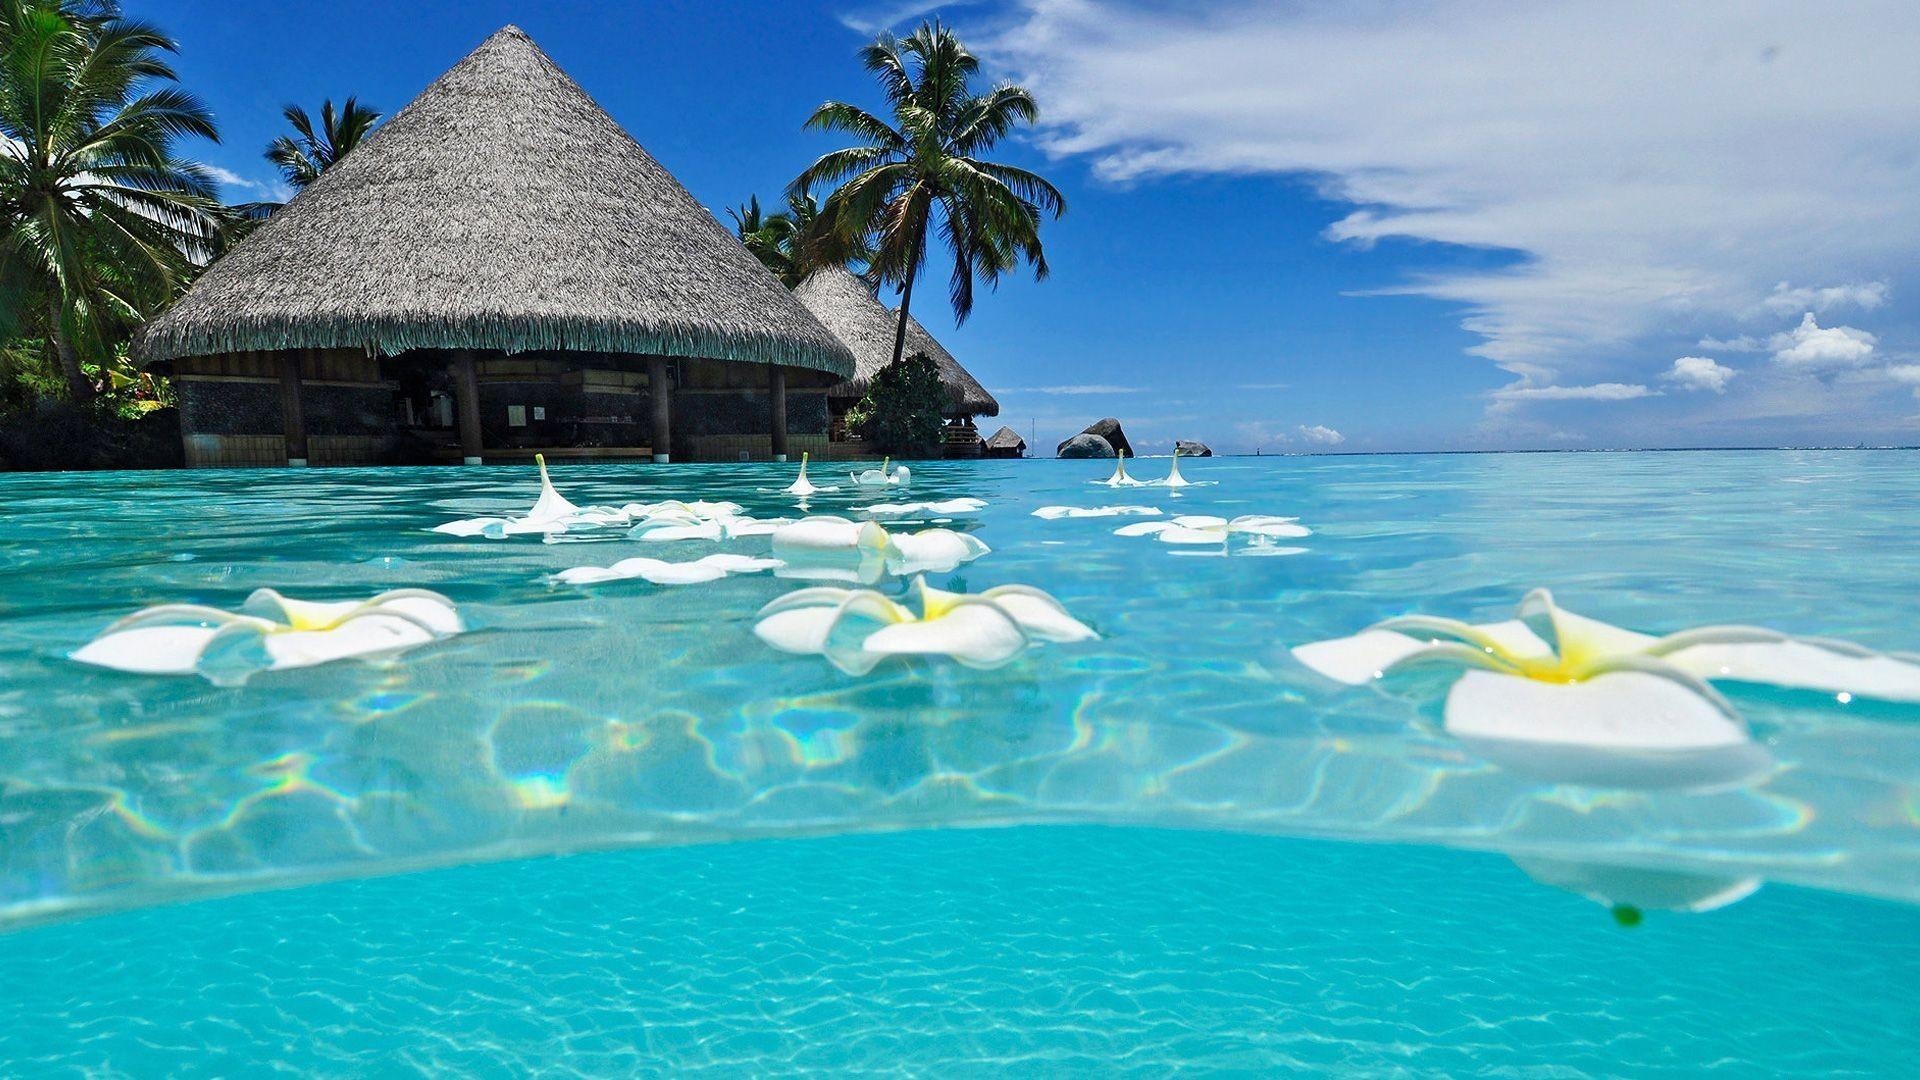 Paradise-Beach-Desktop-Wallpapers.jpg